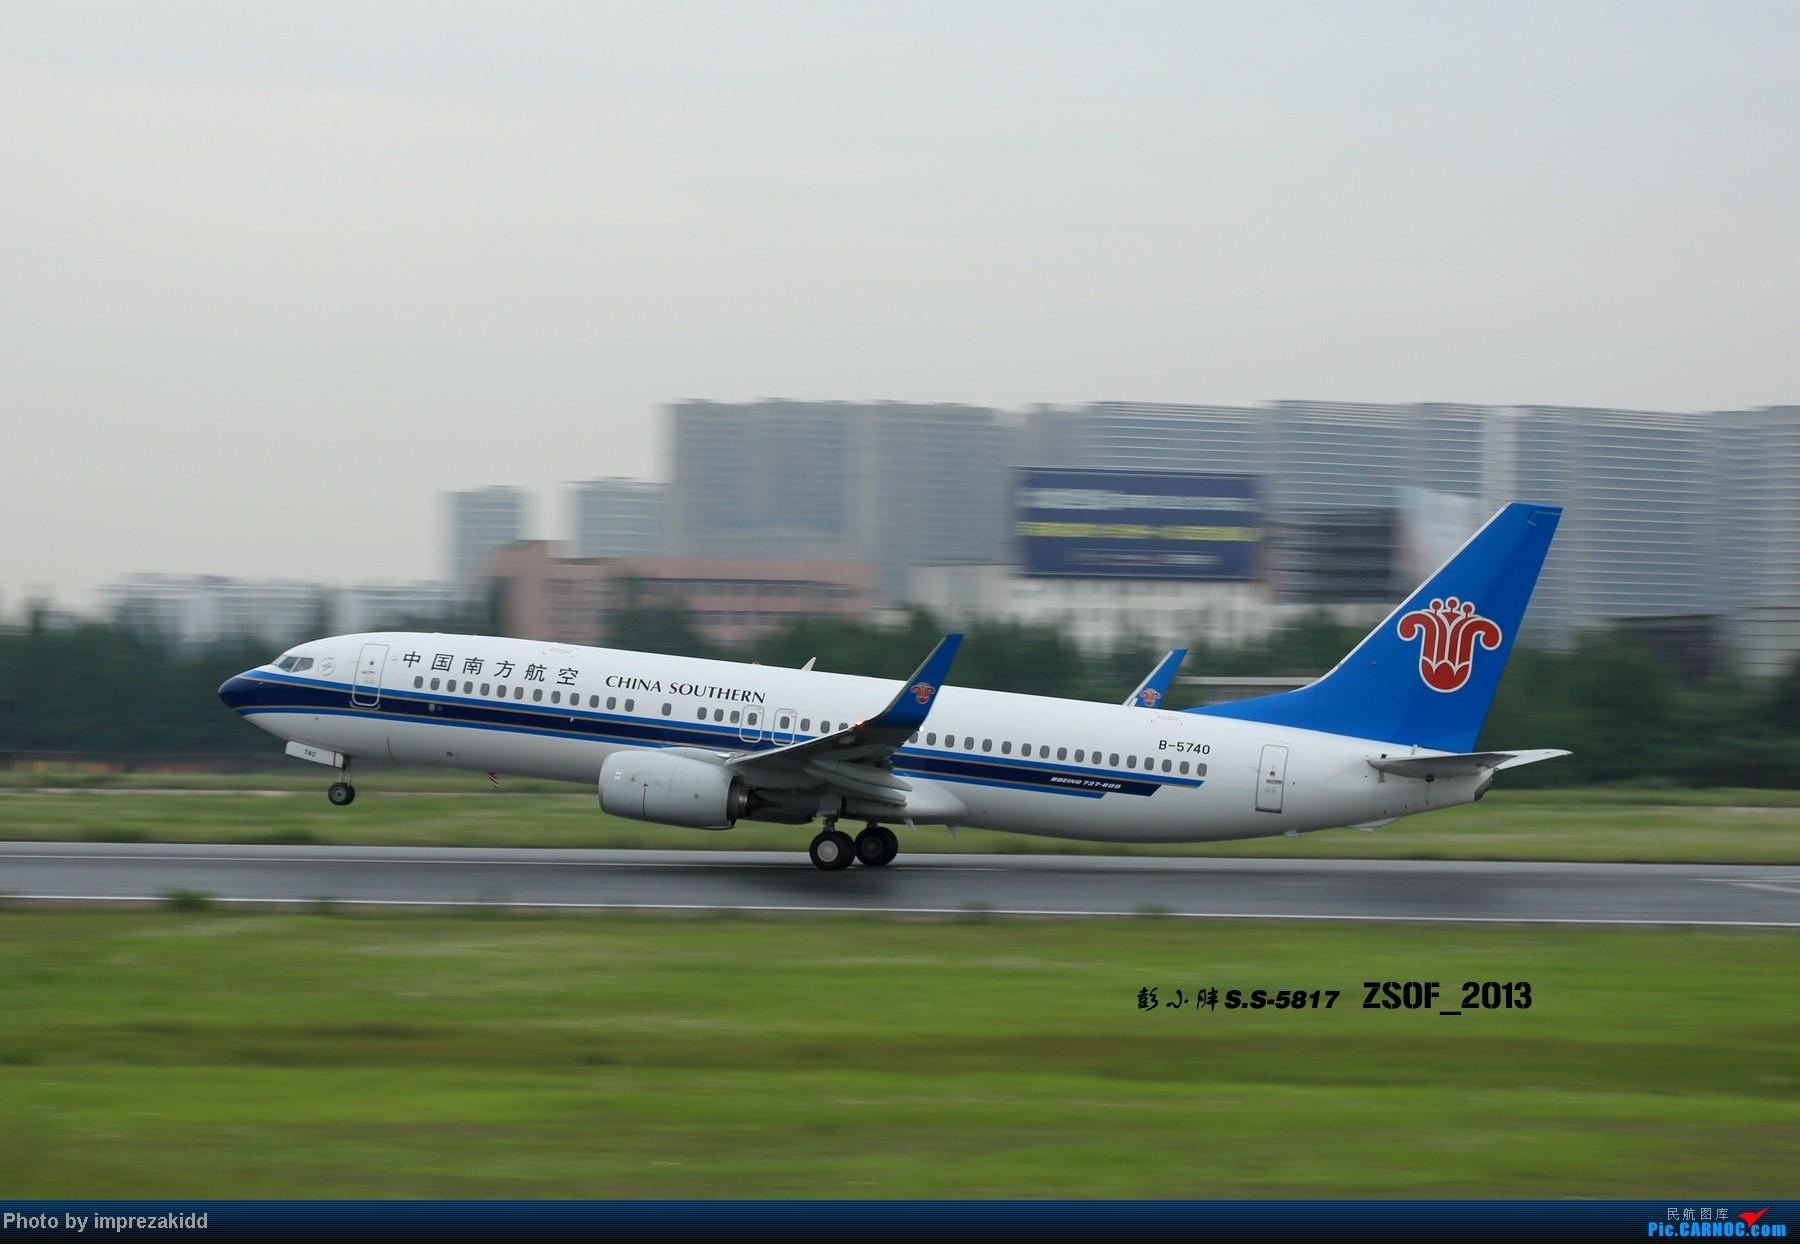 Re:[原创]【骆幕迎新】骆岗LastDay 纪念曾经属于我们的骆岗 BOEING 737-800 B-5740 ZSOF 小二楼